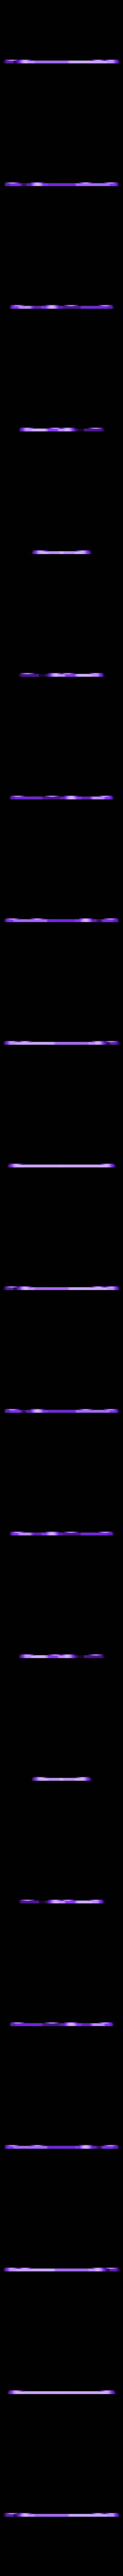 cam plate bottom (1pcs).STL Download STL file Folding Quadcopter 450 Frame • 3D print object, AleksandrDolzhenko